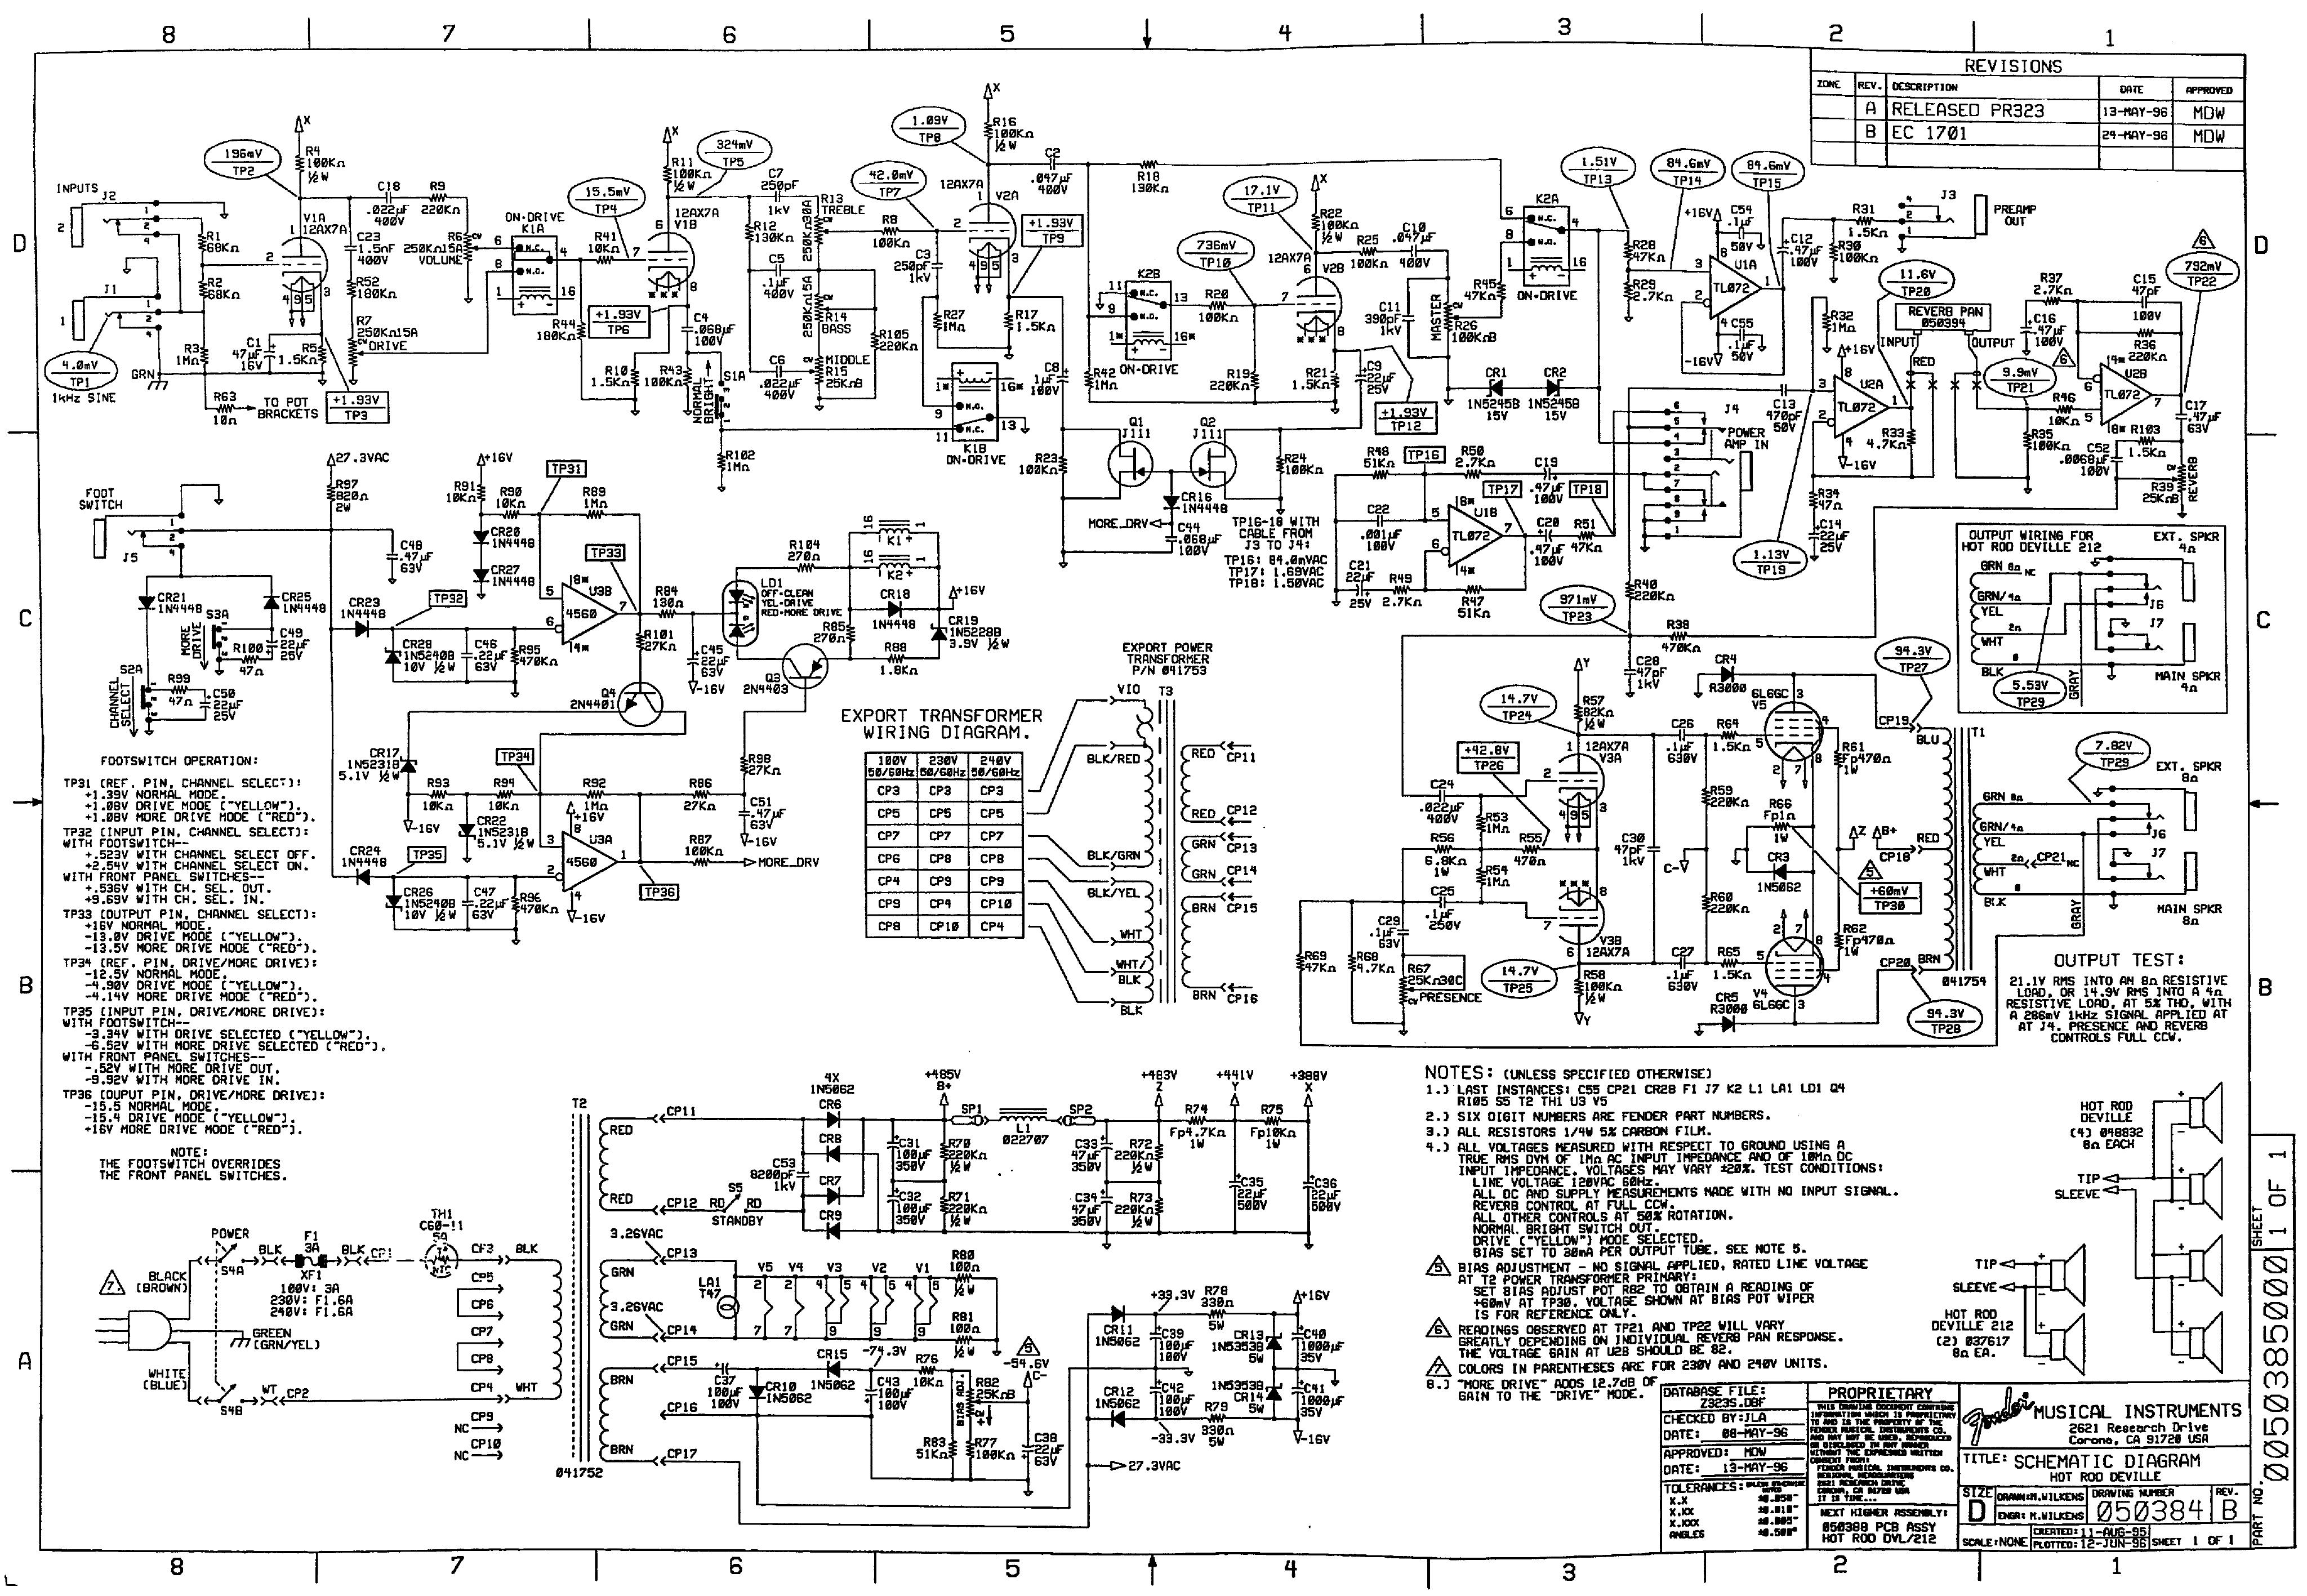 Modern Srv Strat Wiring Diagram Embellishment - Electrical System ...